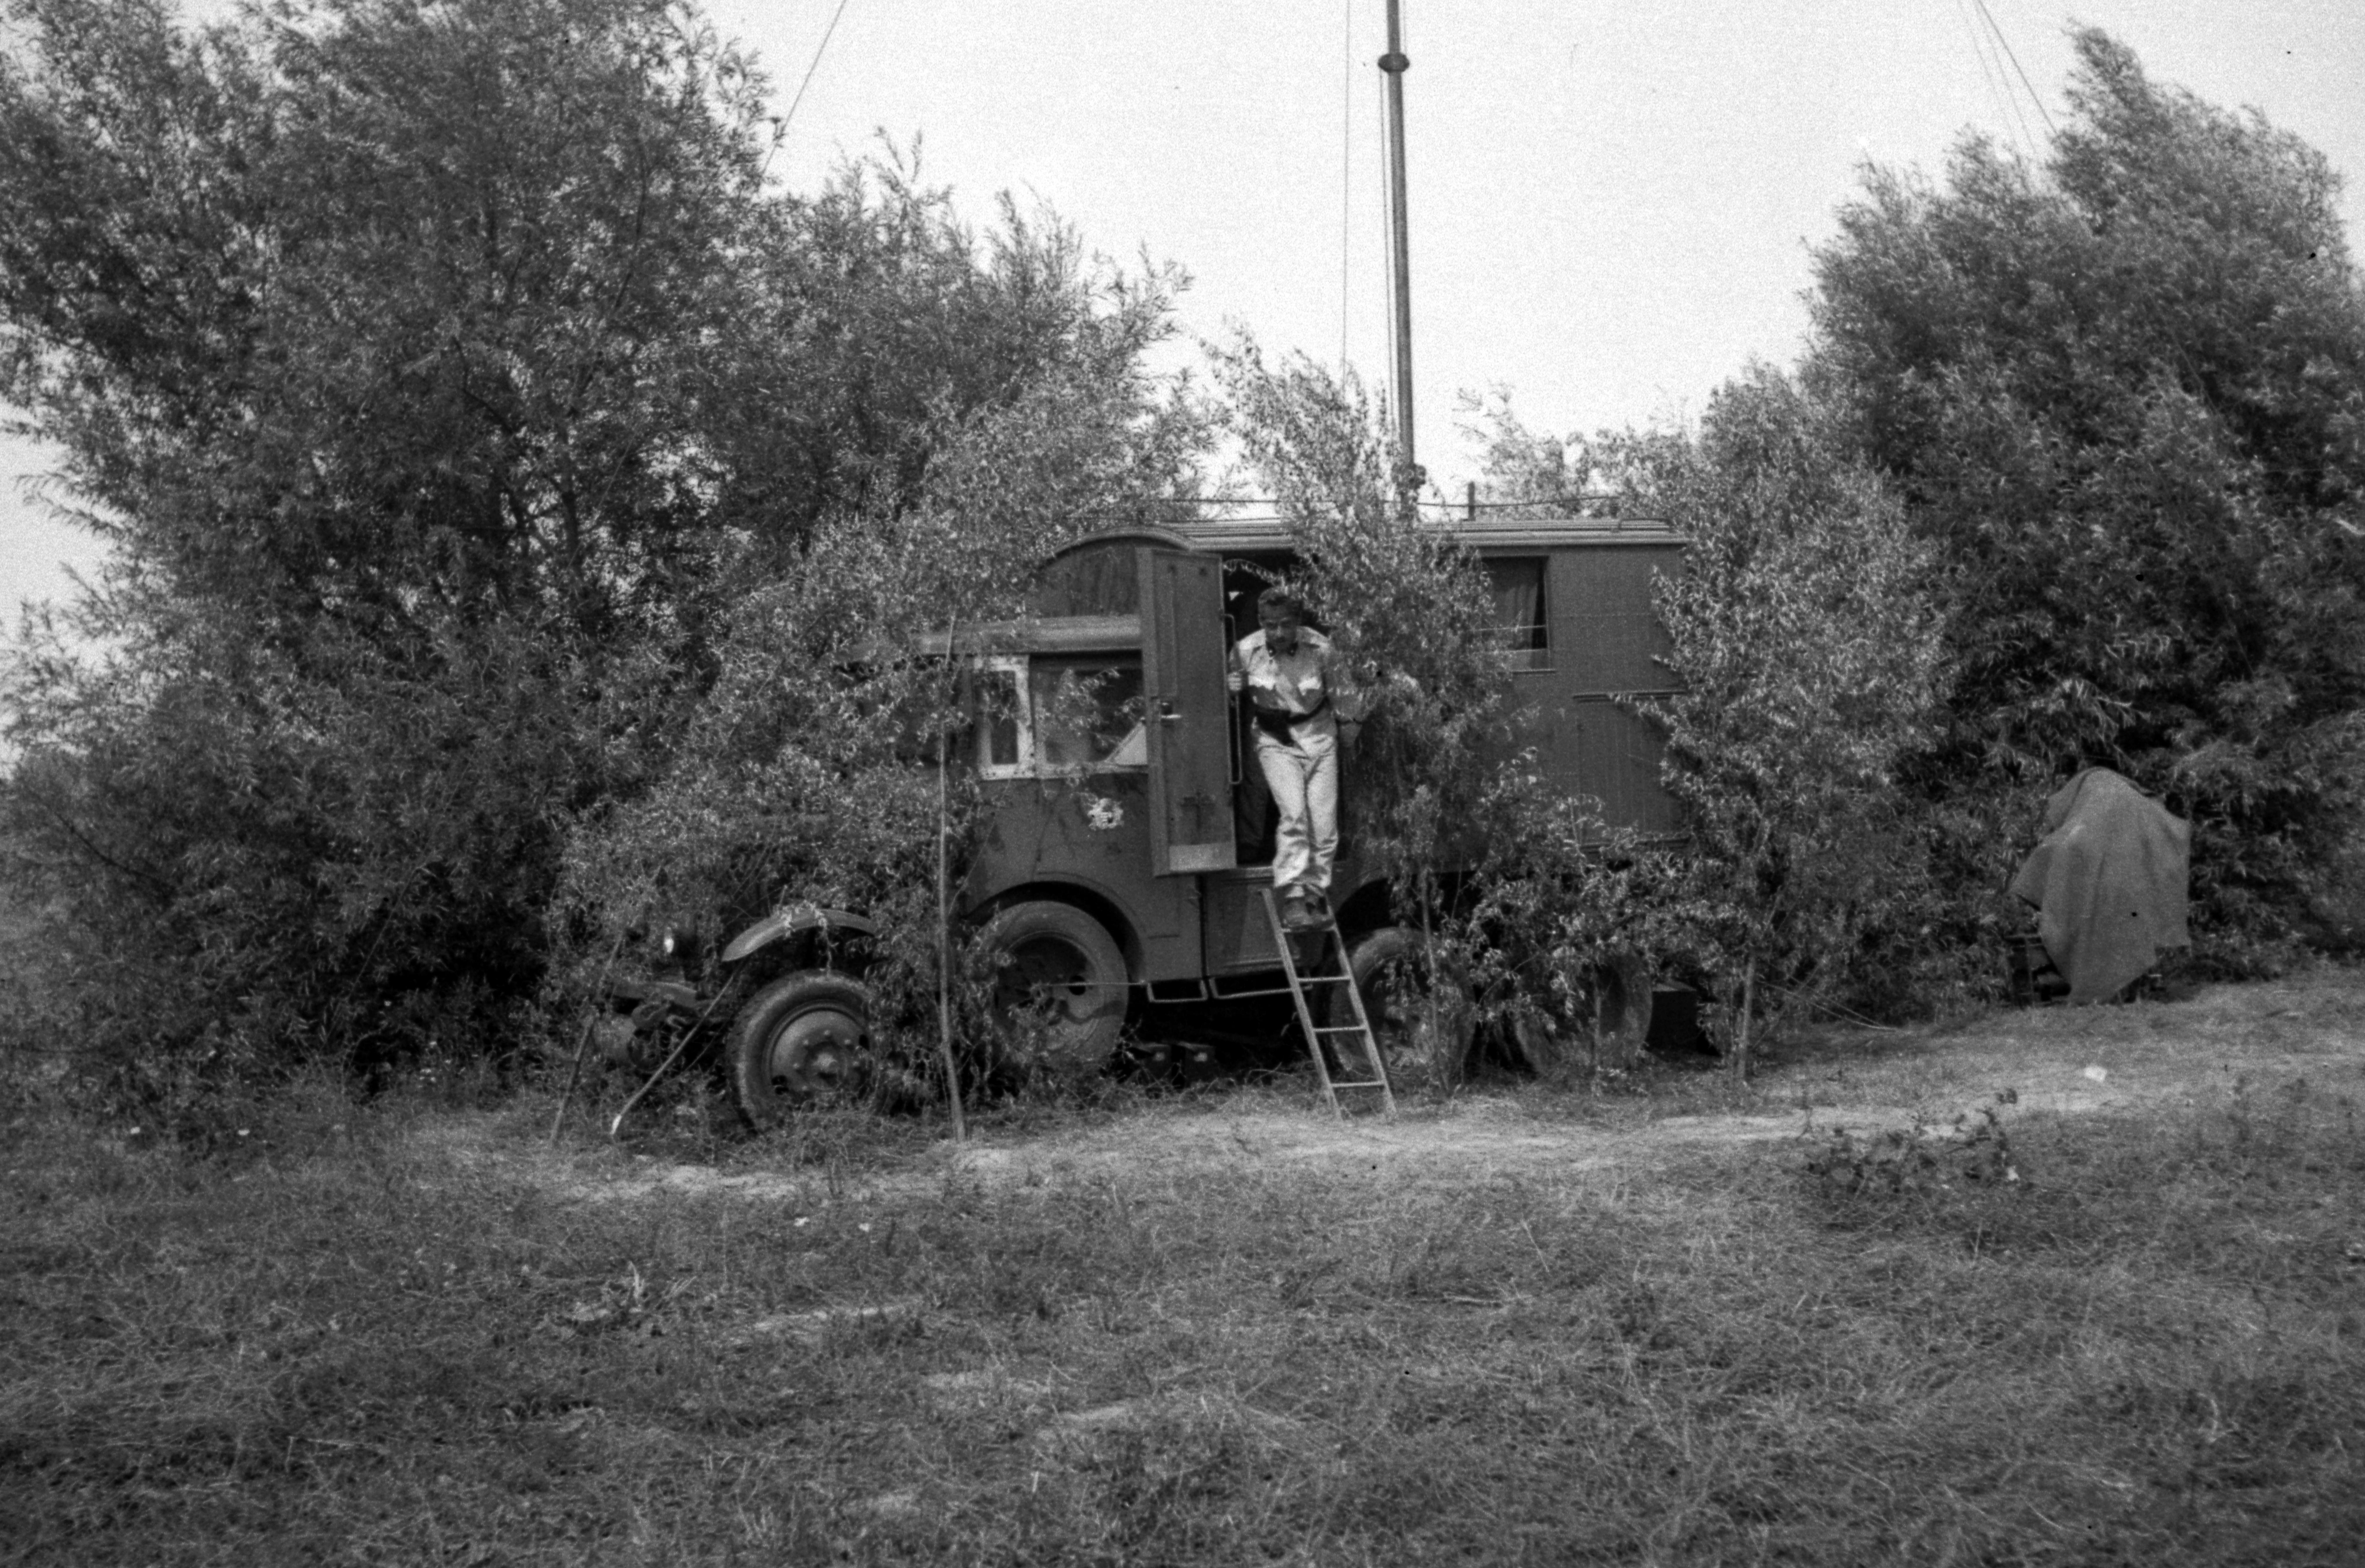 File:Commercial vehicle, radio broadcasting Fortepan 71128 jpg